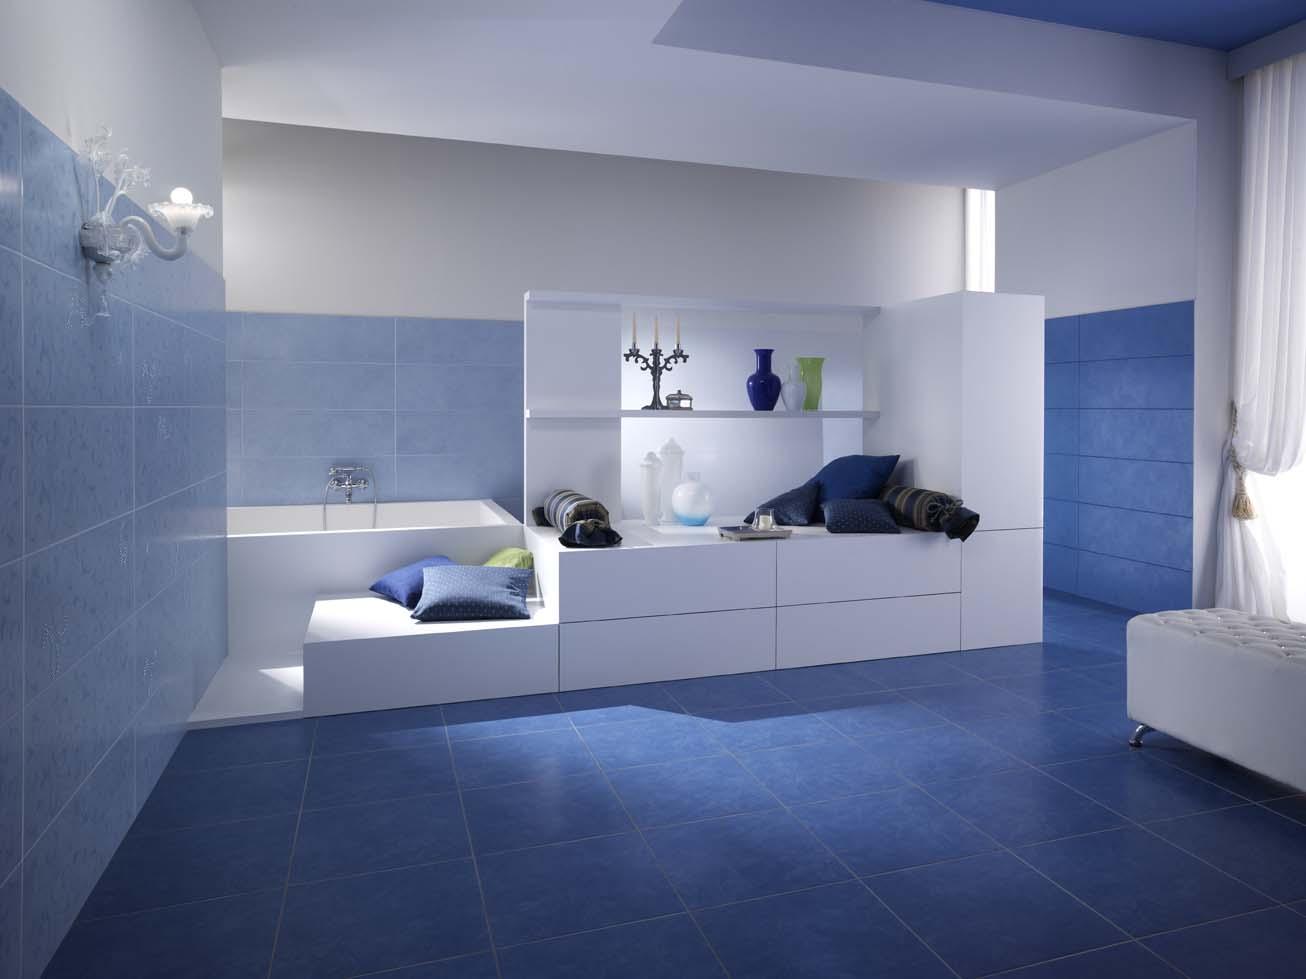 arredo bagno piastrelle imola ceramica. Black Bedroom Furniture Sets. Home Design Ideas